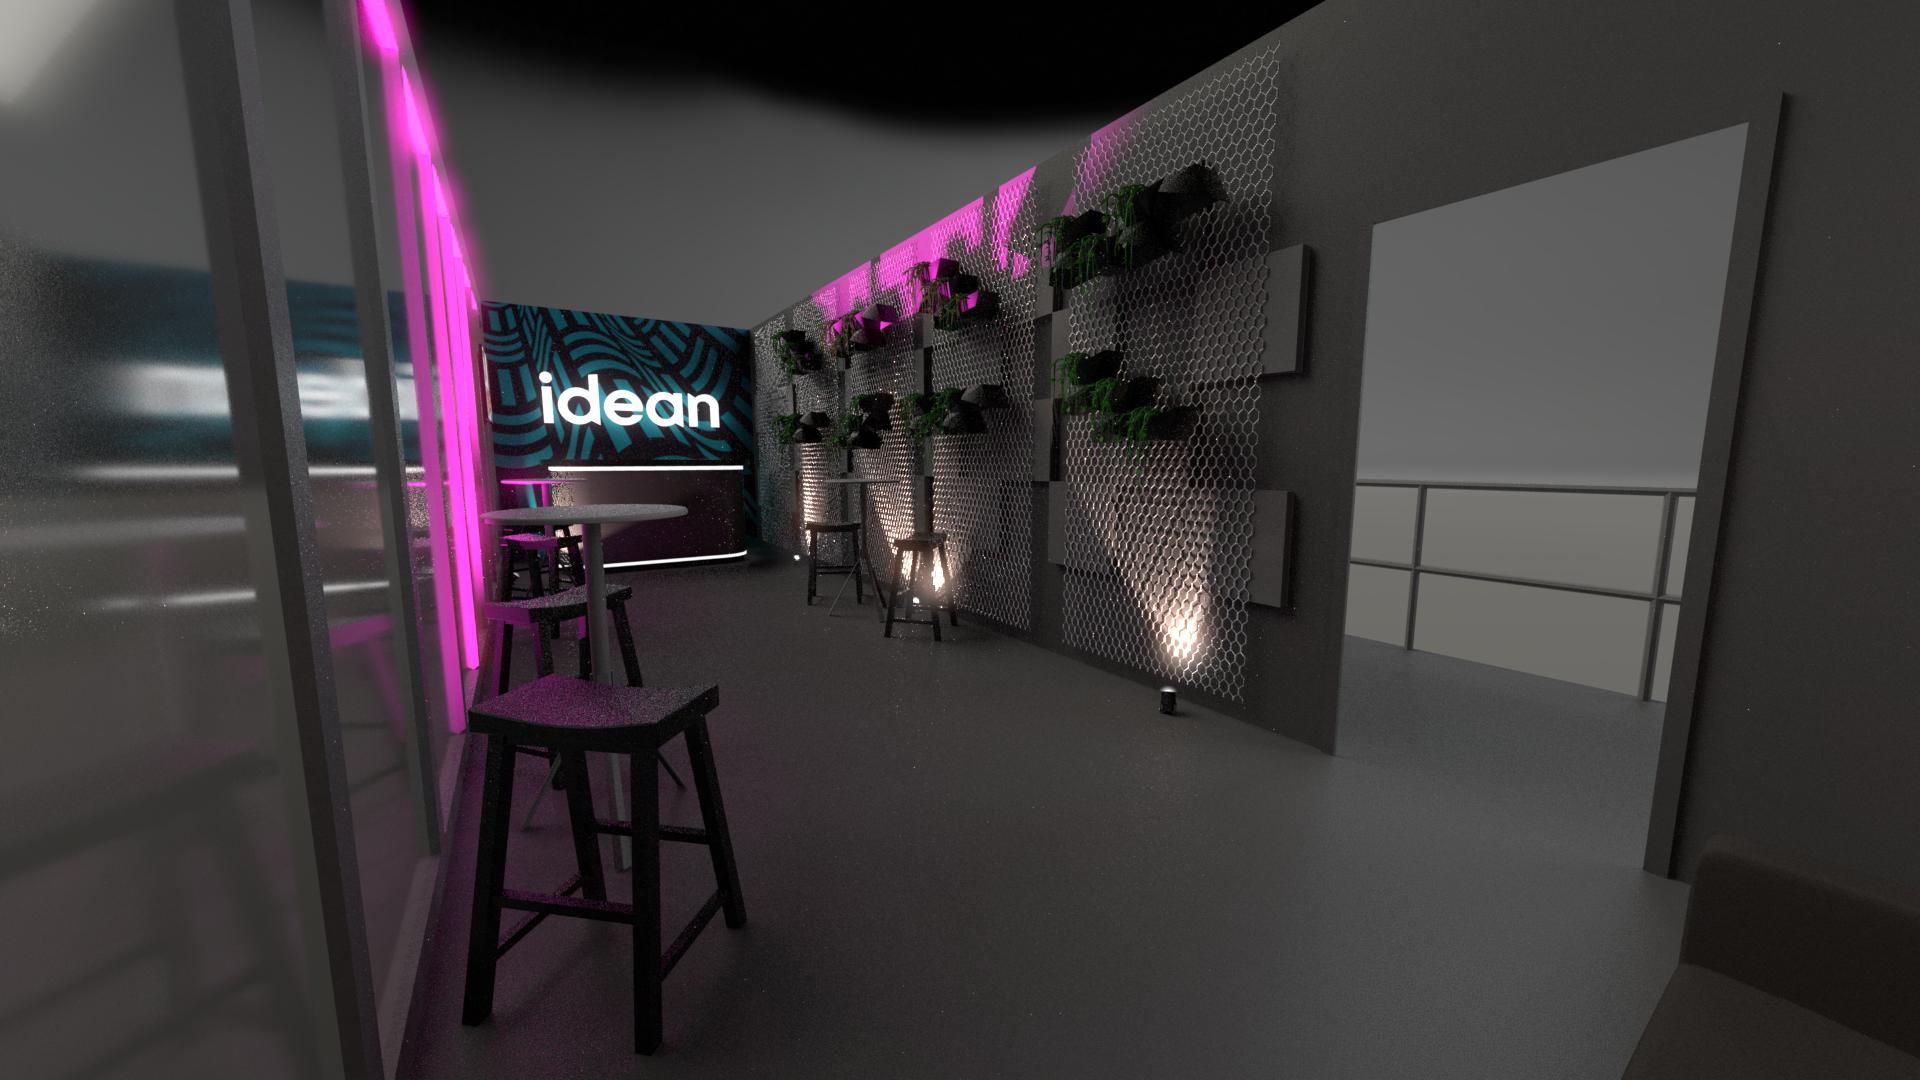 Idean Slush Booth Design